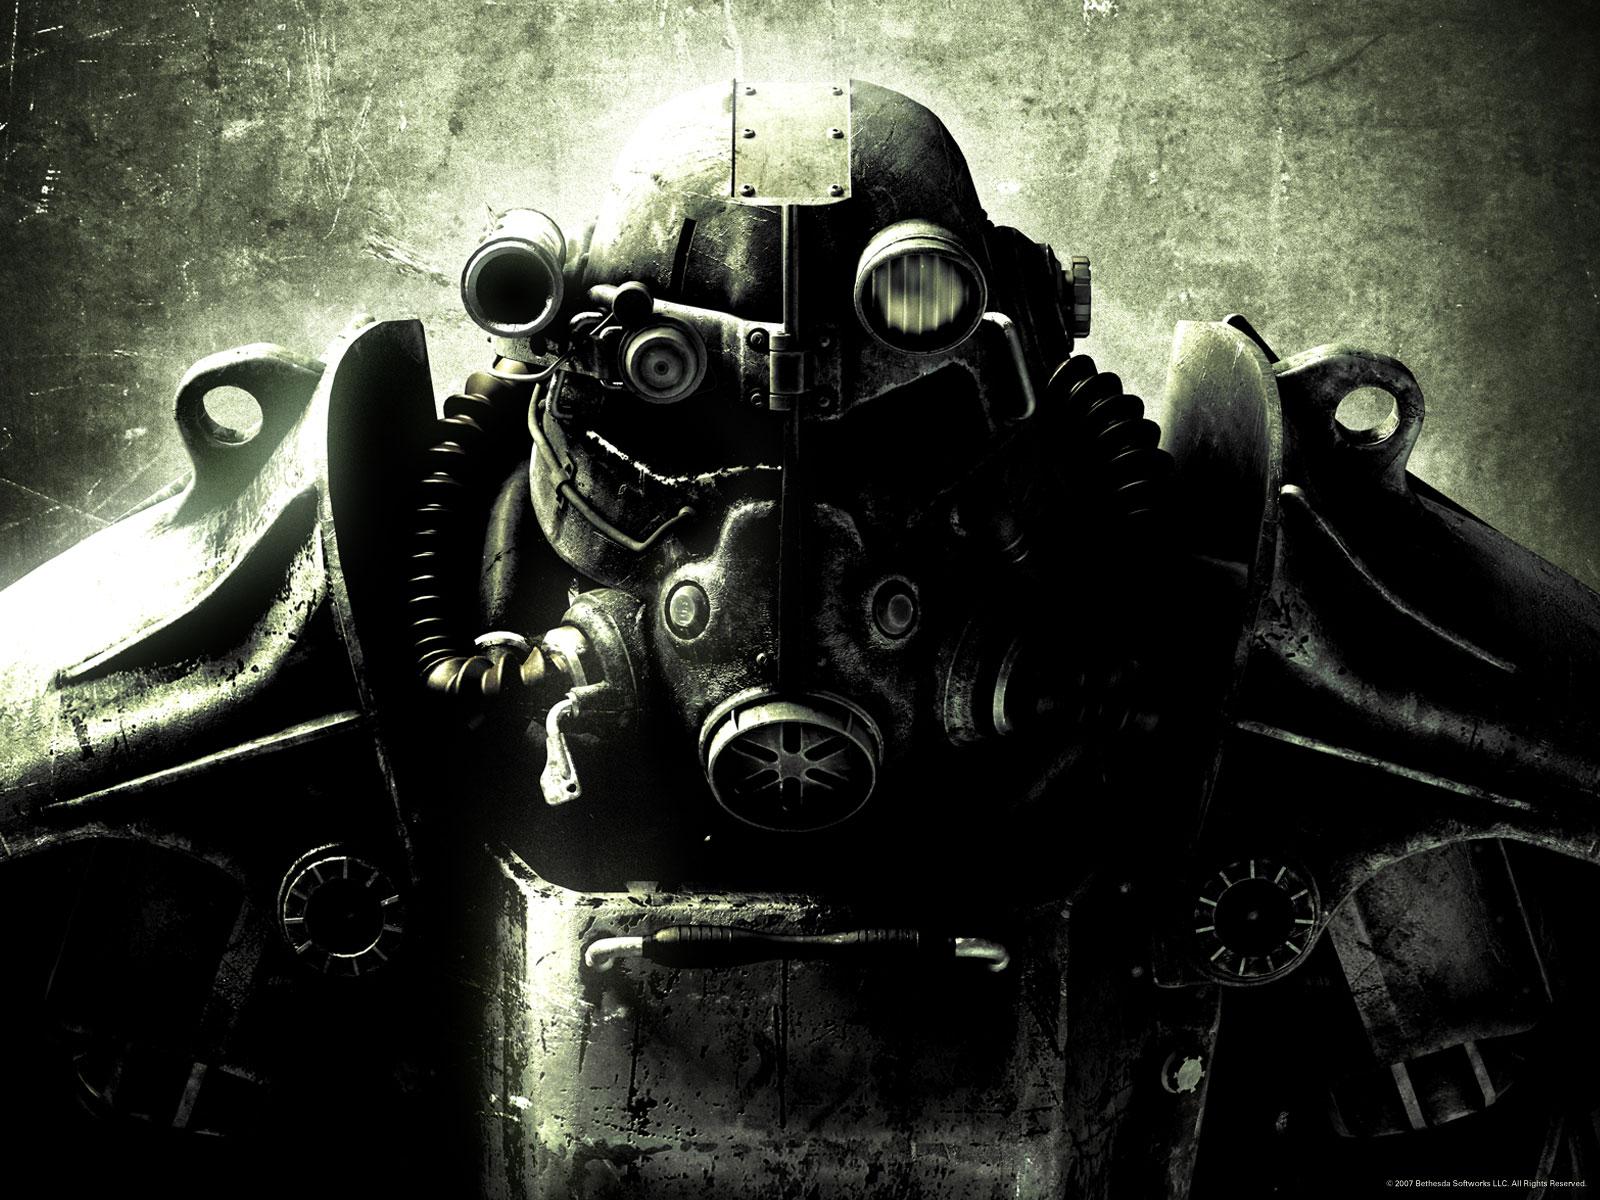 http://2.bp.blogspot.com/_2U3U6AwE-ZQ/THv8b295OYI/AAAAAAAAAWE/GfYVMyTihiQ/s1600/mechanic-soldier%28www.TheWallpapers.org%29.jpg